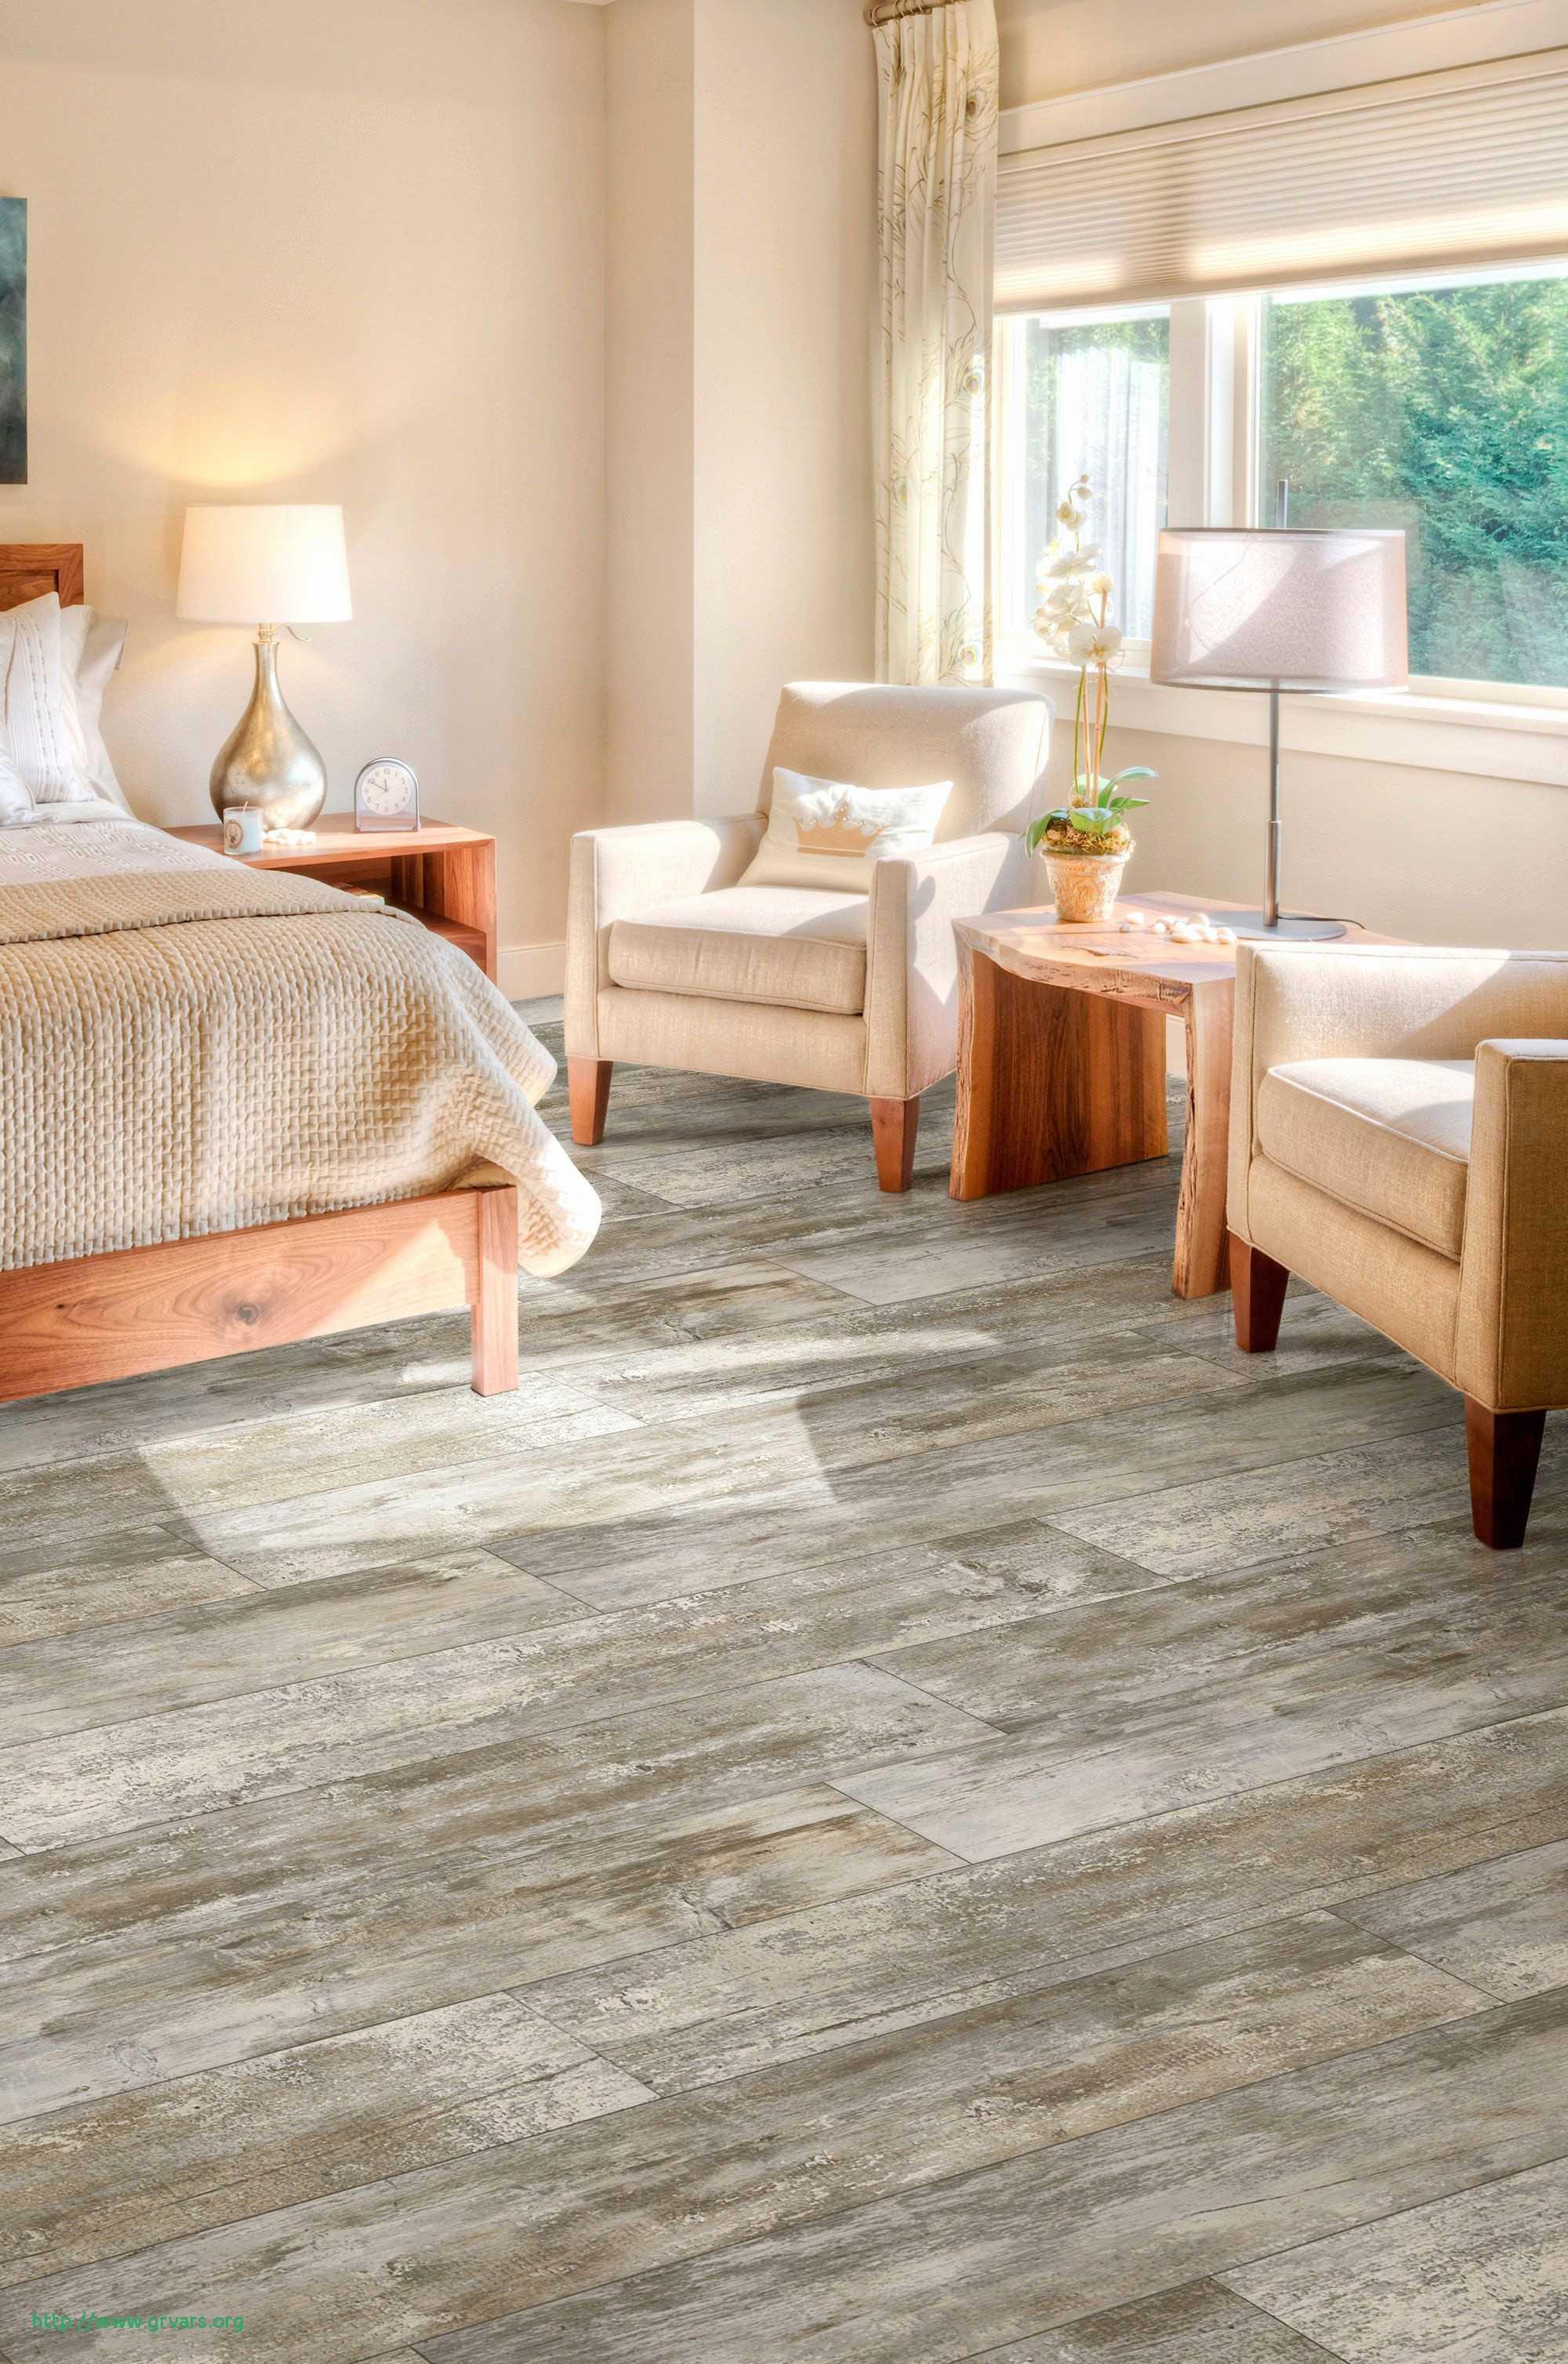 cheap hardwood flooring raleigh nc of 16 charmant step by step hardwood floor installation ideas blog for hardwood floor wood hardwood floor types unique i pinimg 736x 0d 7b 00 luxury wood